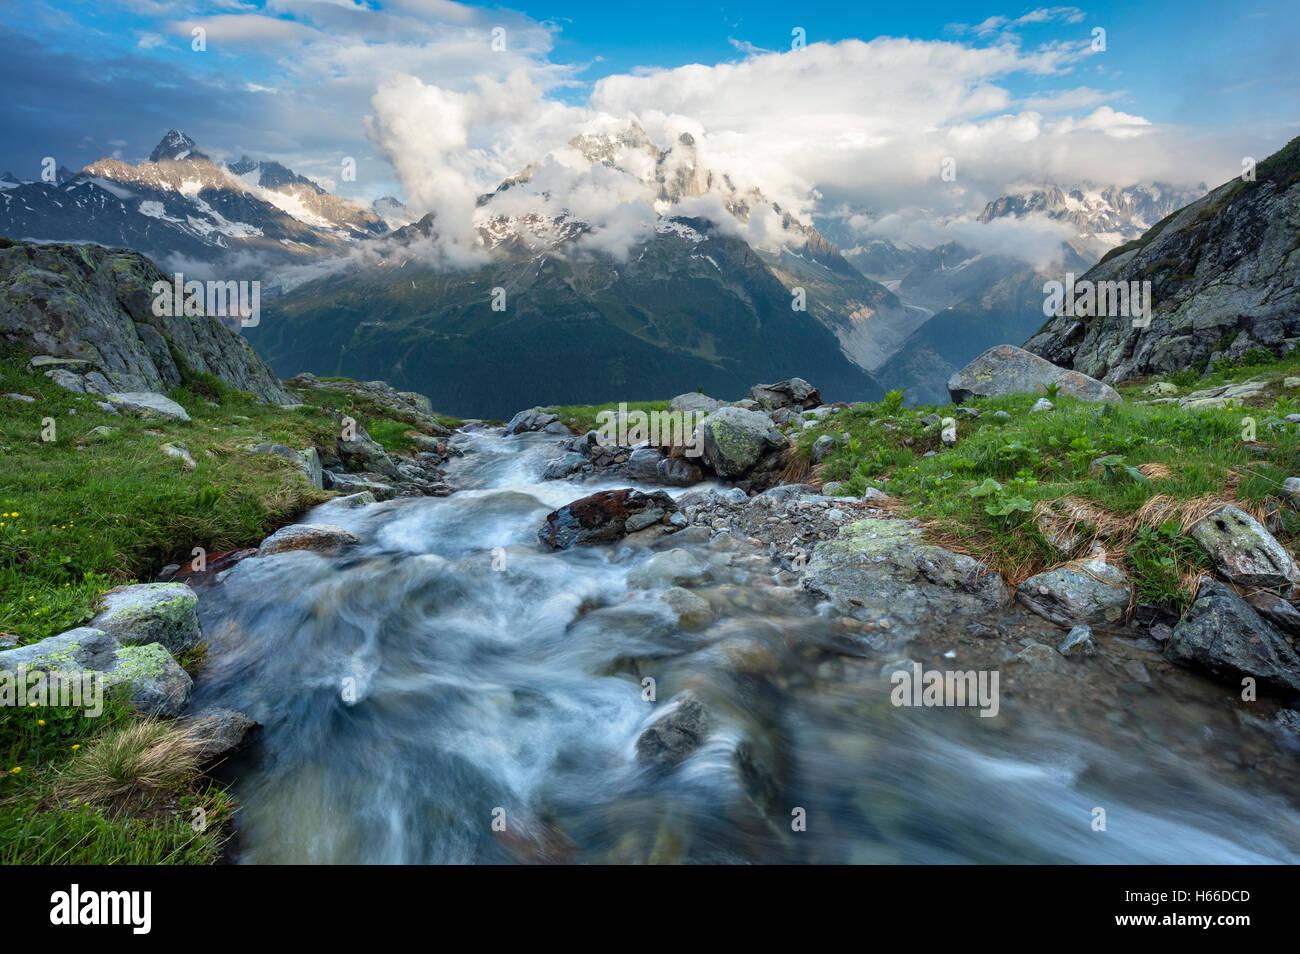 Stream beneath Aiguille Verte, Chamonix Valley, French Alps, France. Stock Photo